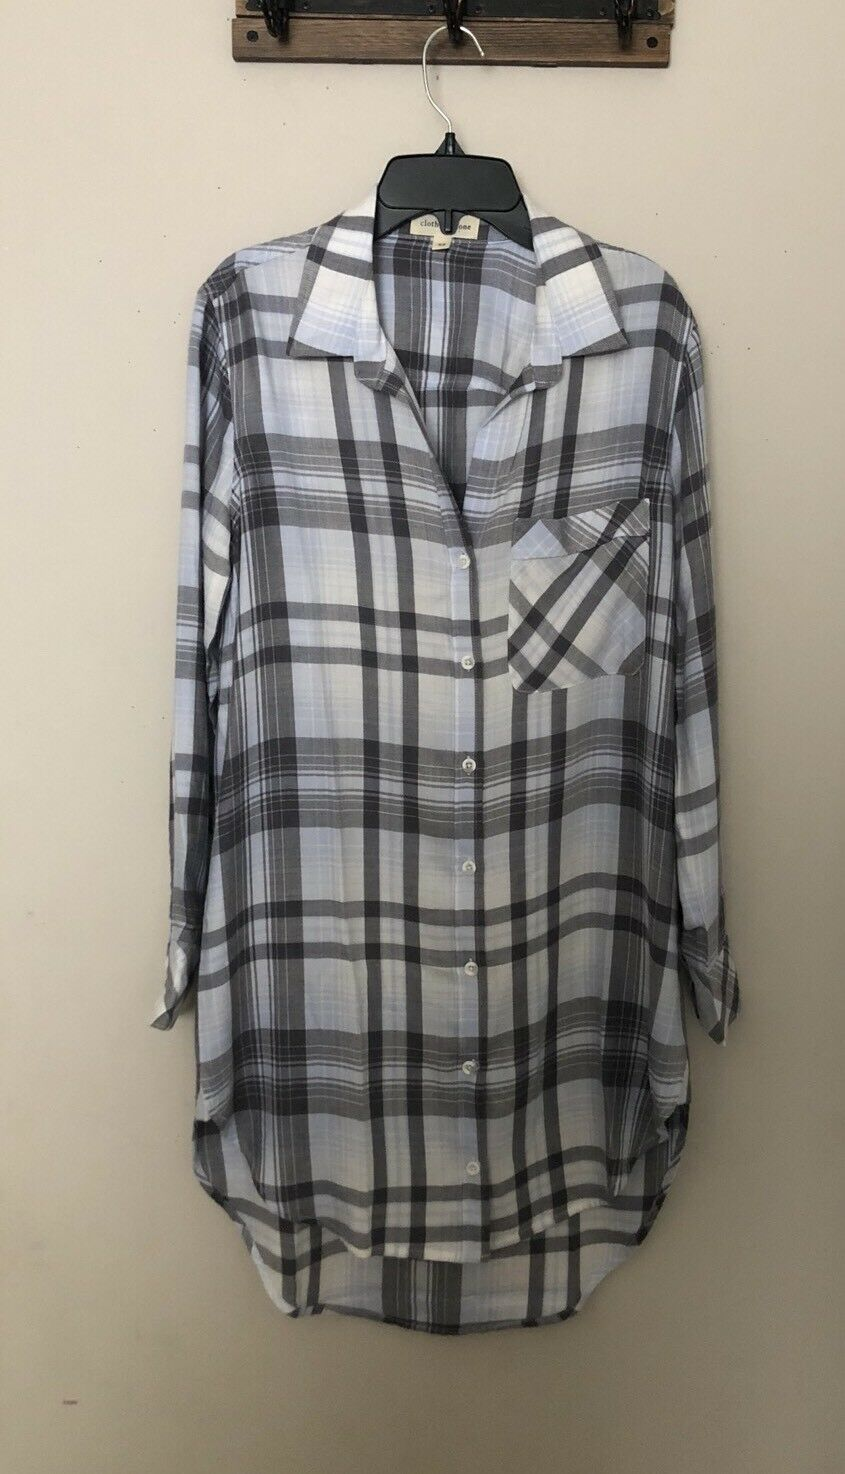 NEW CLOTH & STONE BELLA DAHL Sz XS LONG SLEEVE SHIRT DRESS PLAID Weiß Blau